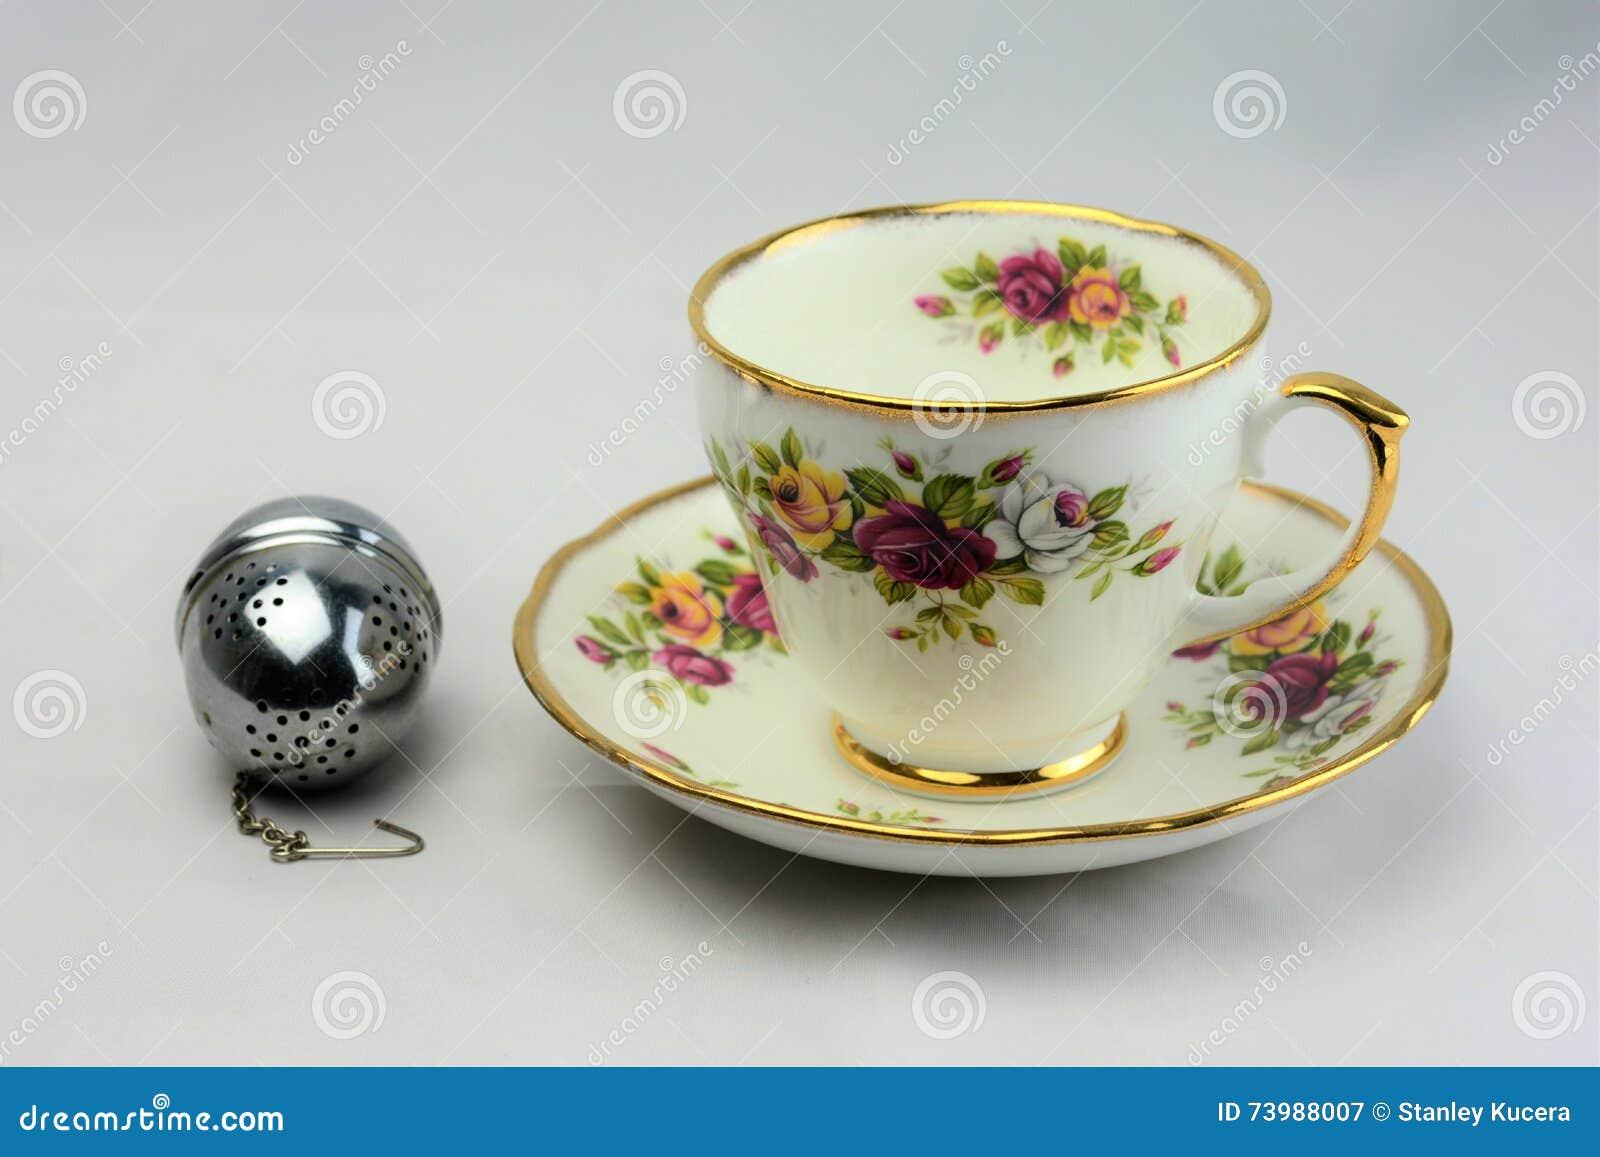 Vintage Bone China Tea Cup and Saucer 4